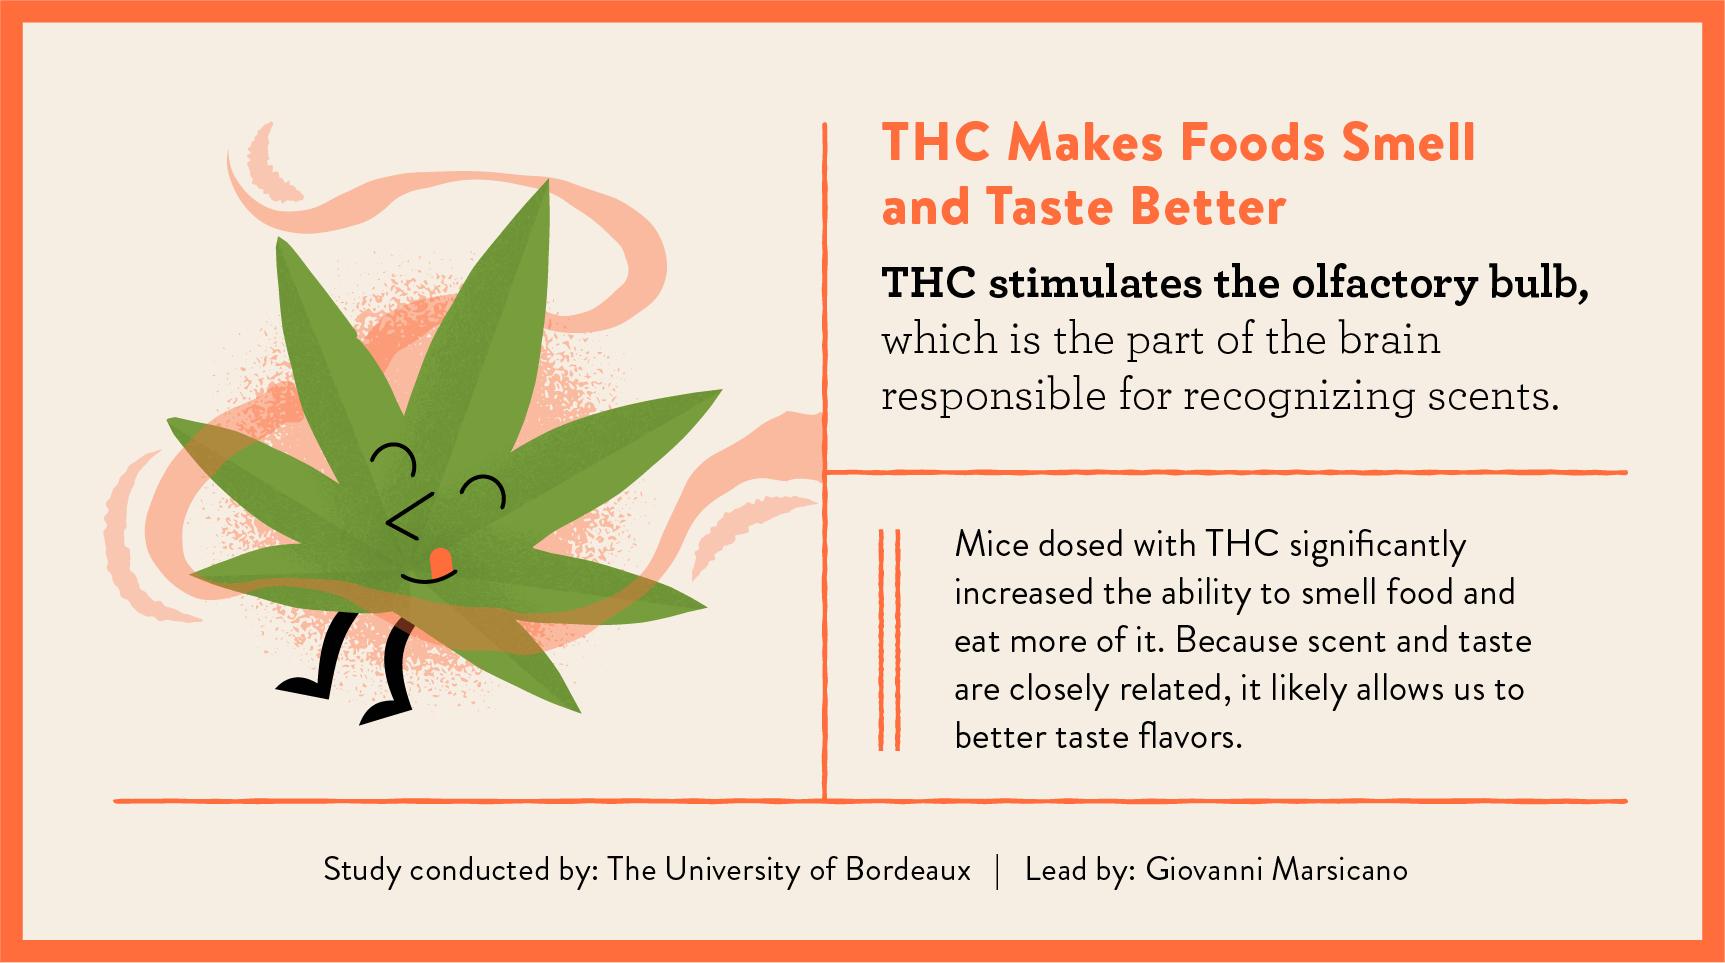 THC makes food taste better study